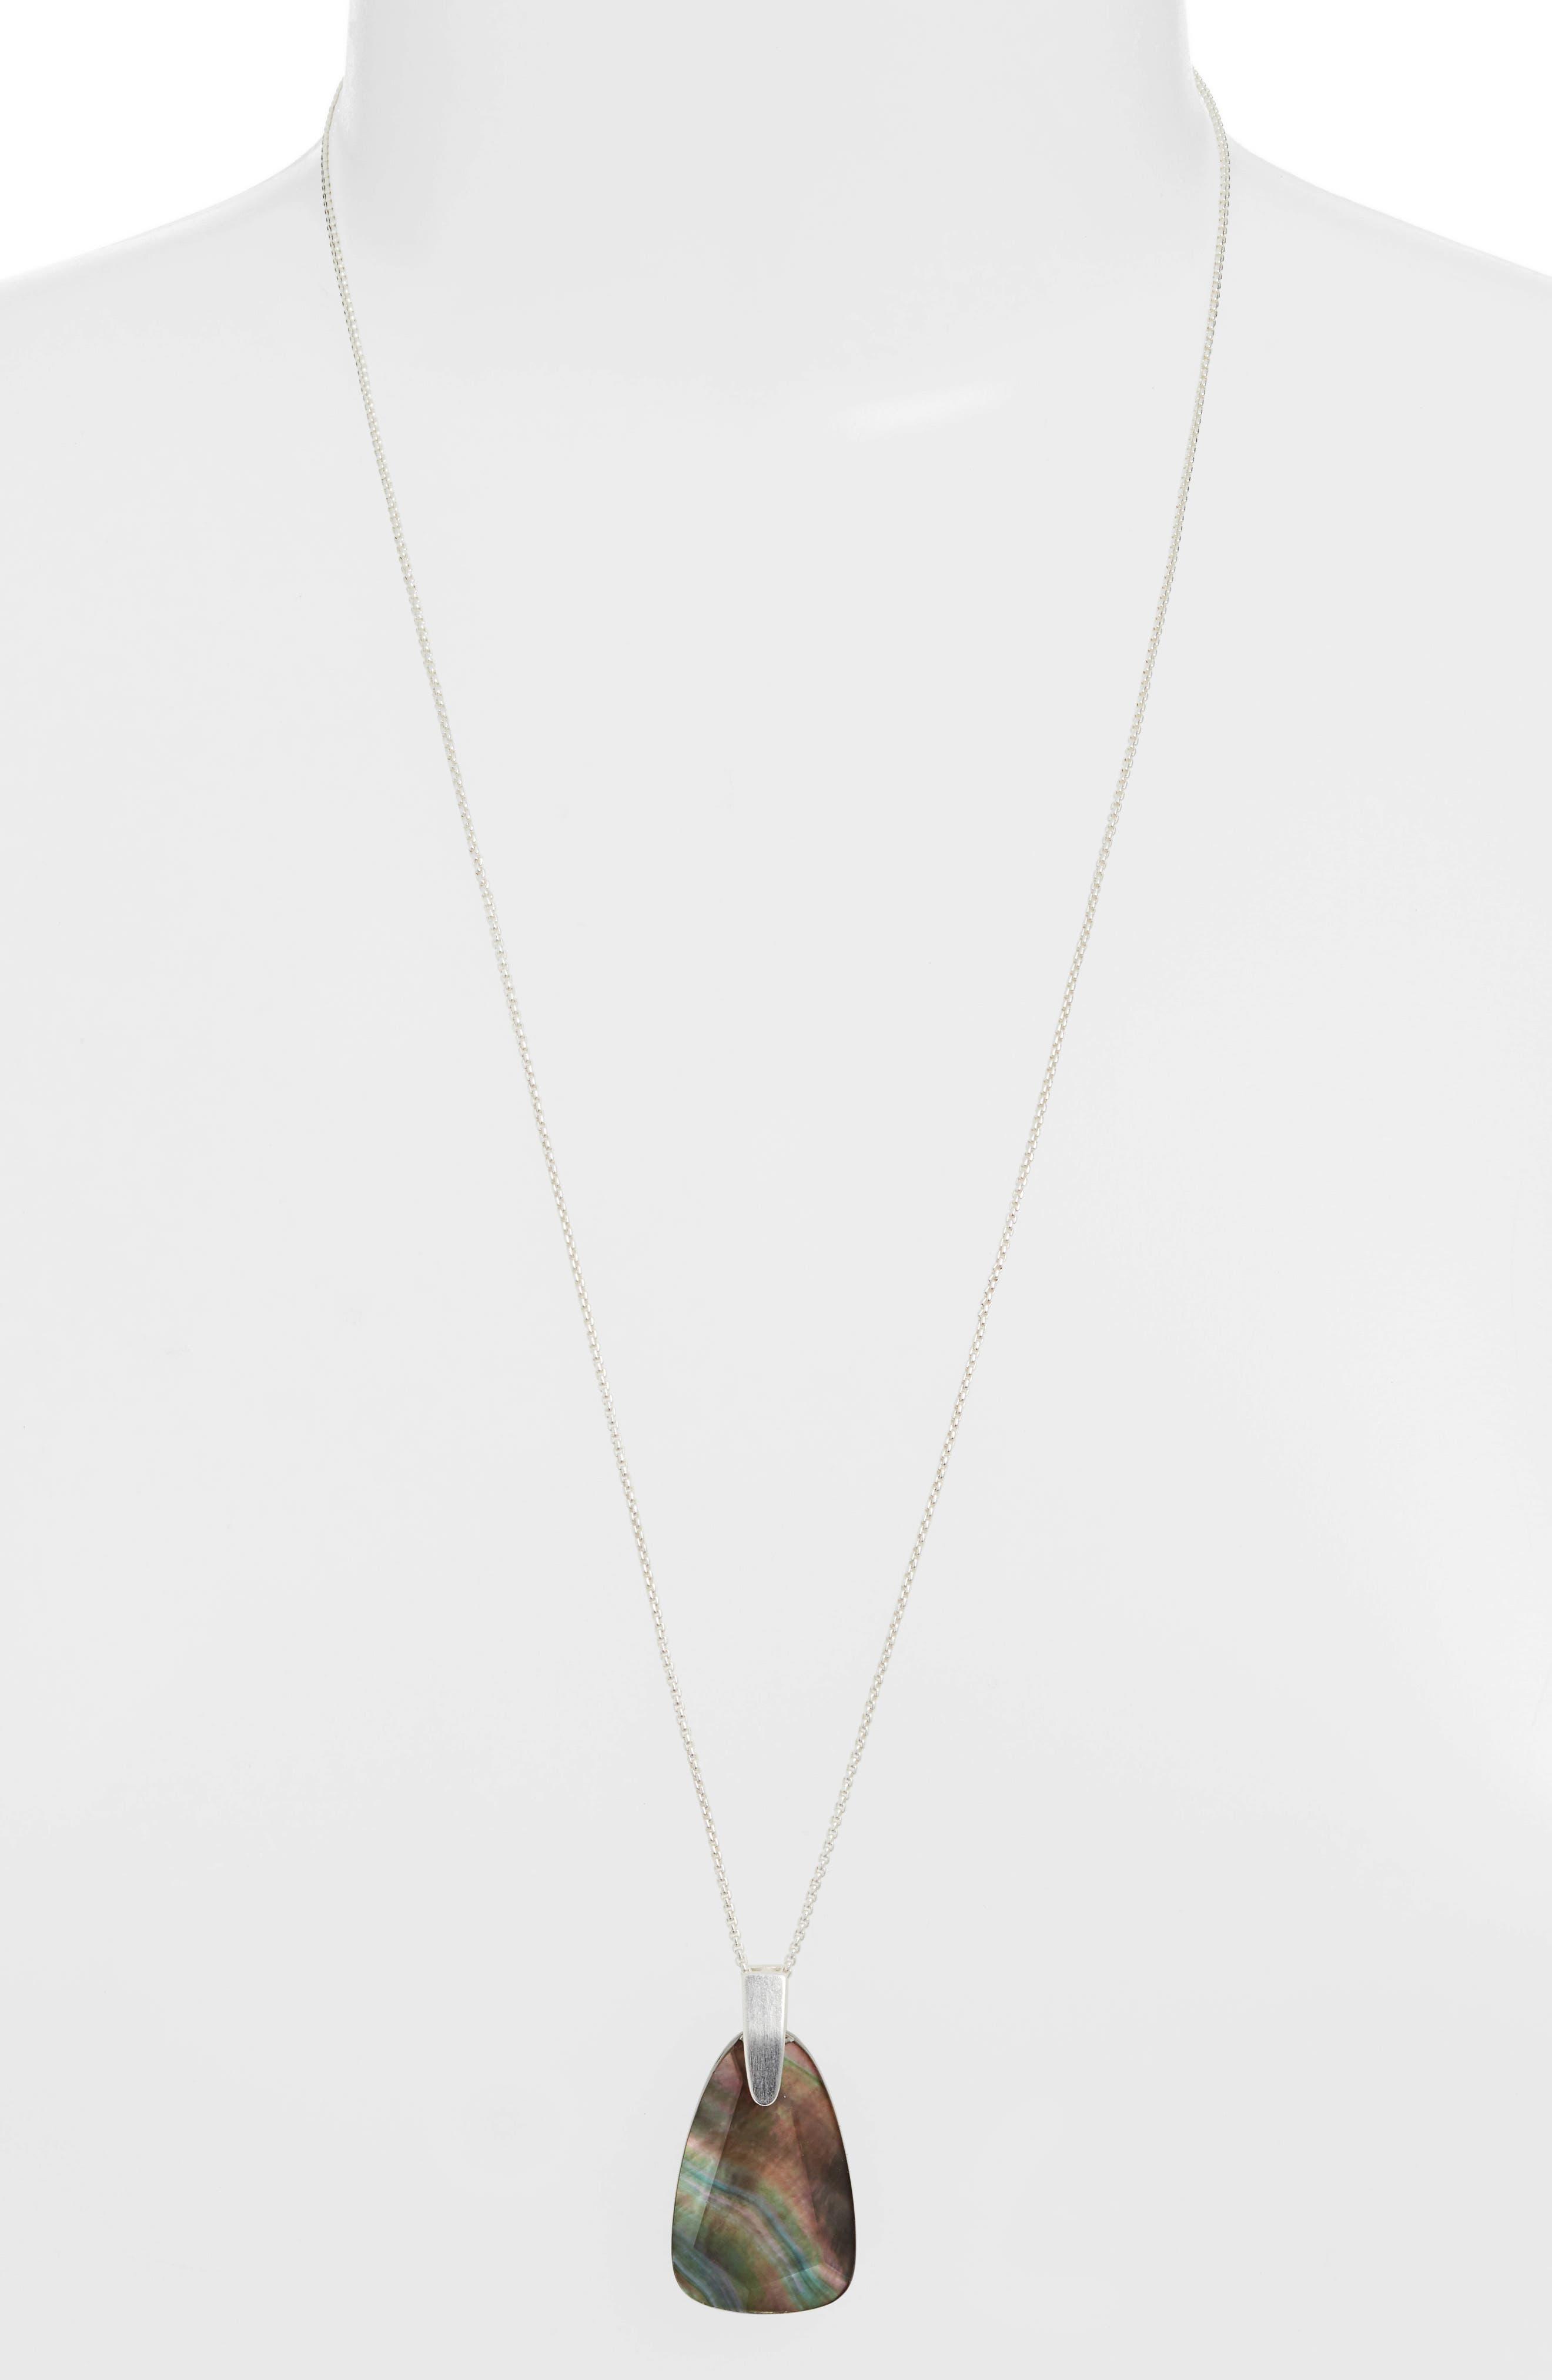 KENDRA SCOTT, Maeve Long Stone Pendant Necklace, Main thumbnail 1, color, BRIGHT SILVER/ BLACK MOP